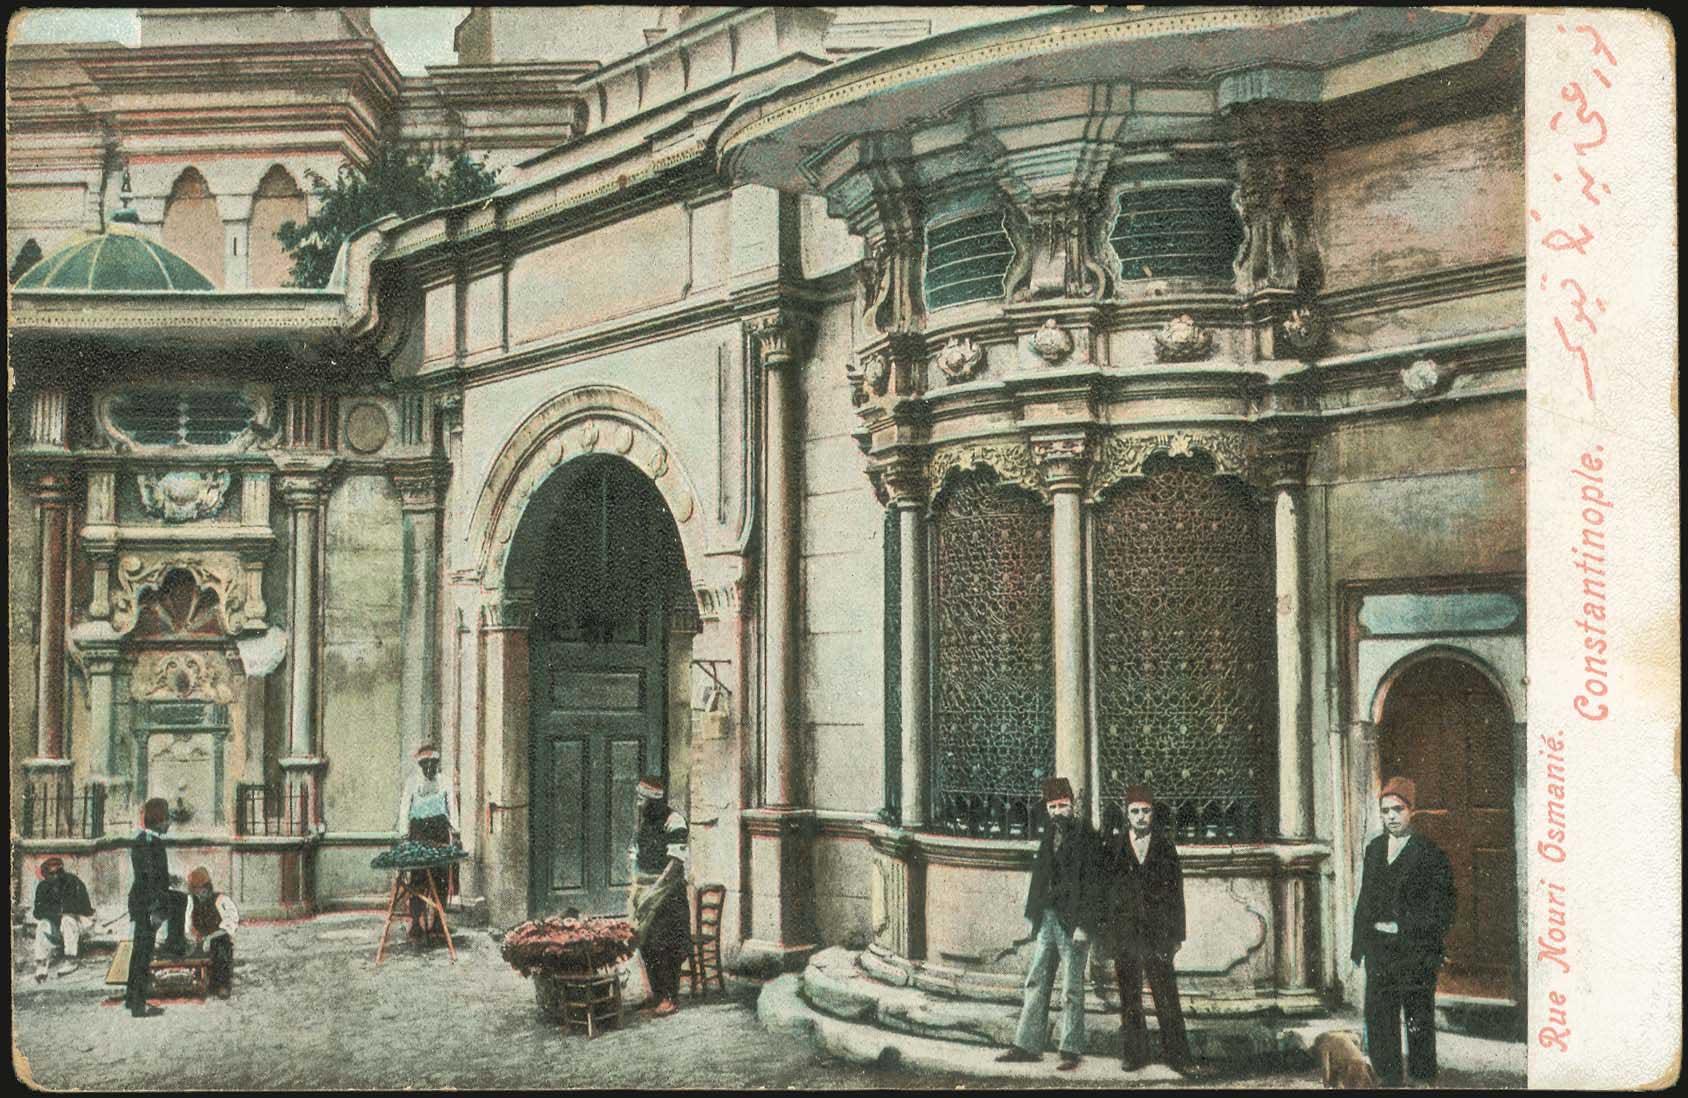 Lot 1756 - -  PICTURE POSTCARDS SMYRNE, CONSTANTINOPLE, ASIA MINOR -  A. Karamitsos Public & Live Internet Auction 675